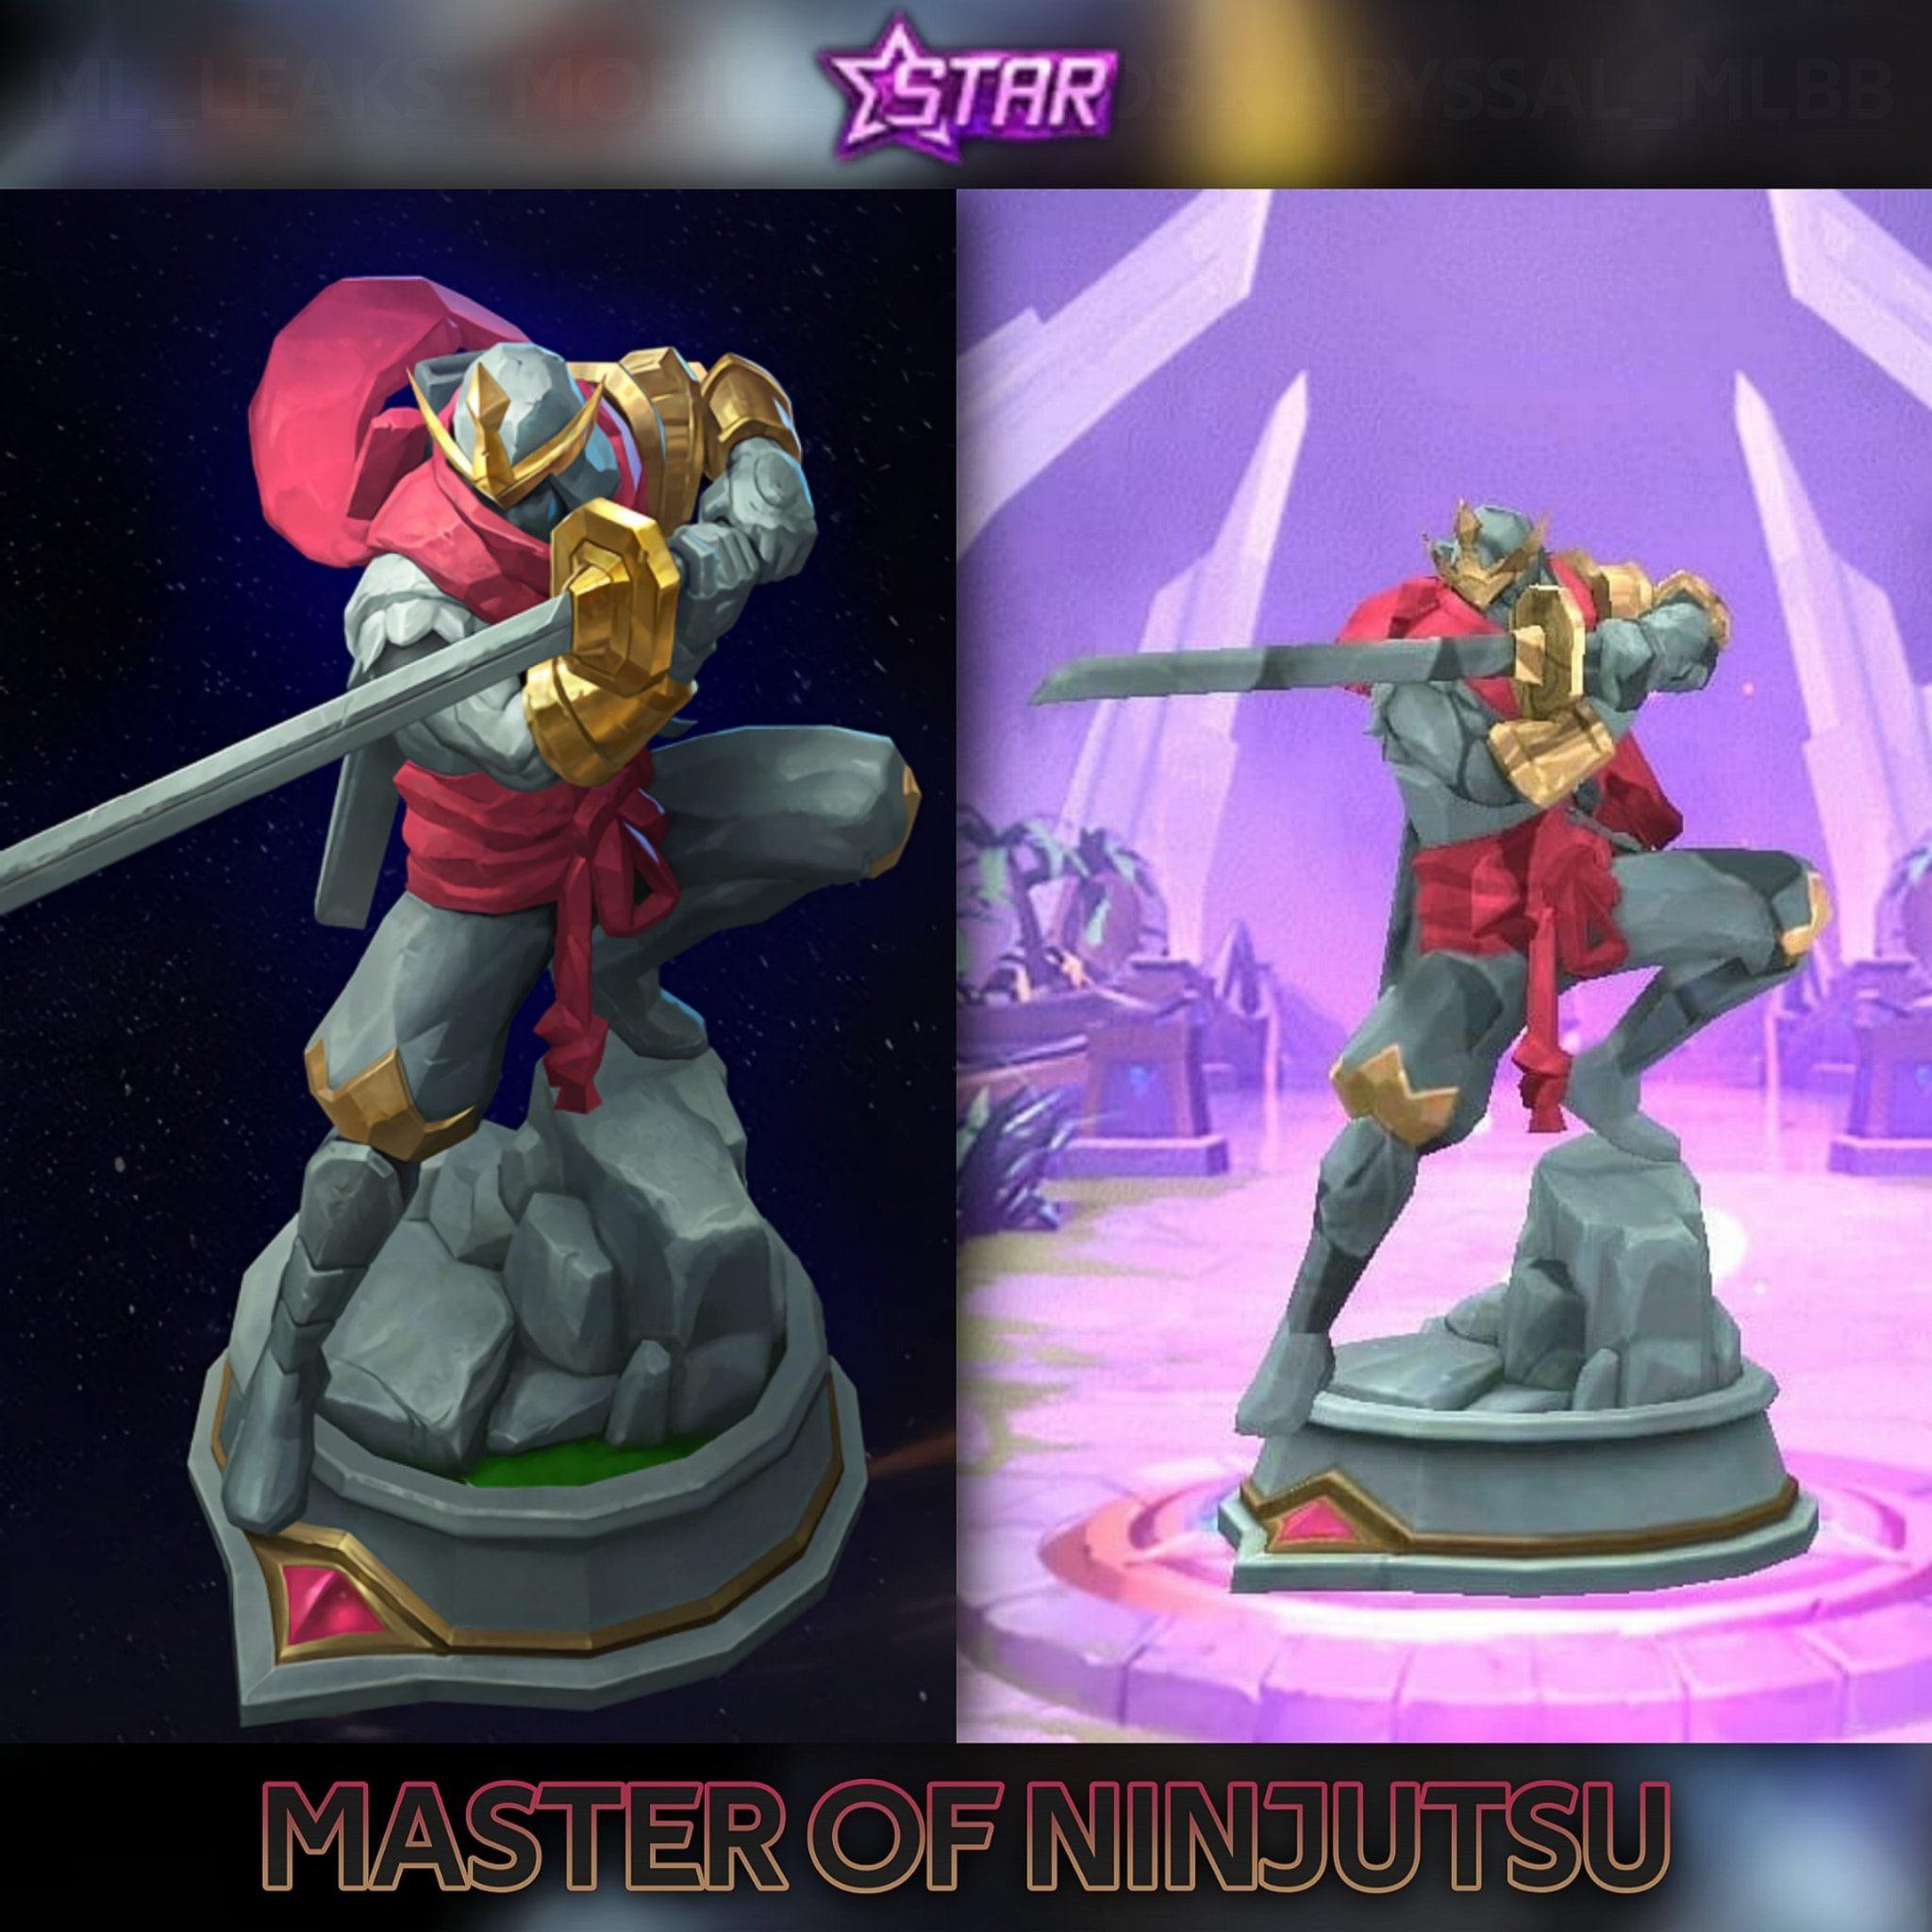 Leaked Sacred Statue Starlight Member Juli ML Hayabusa Mobile Legends, So Cool!